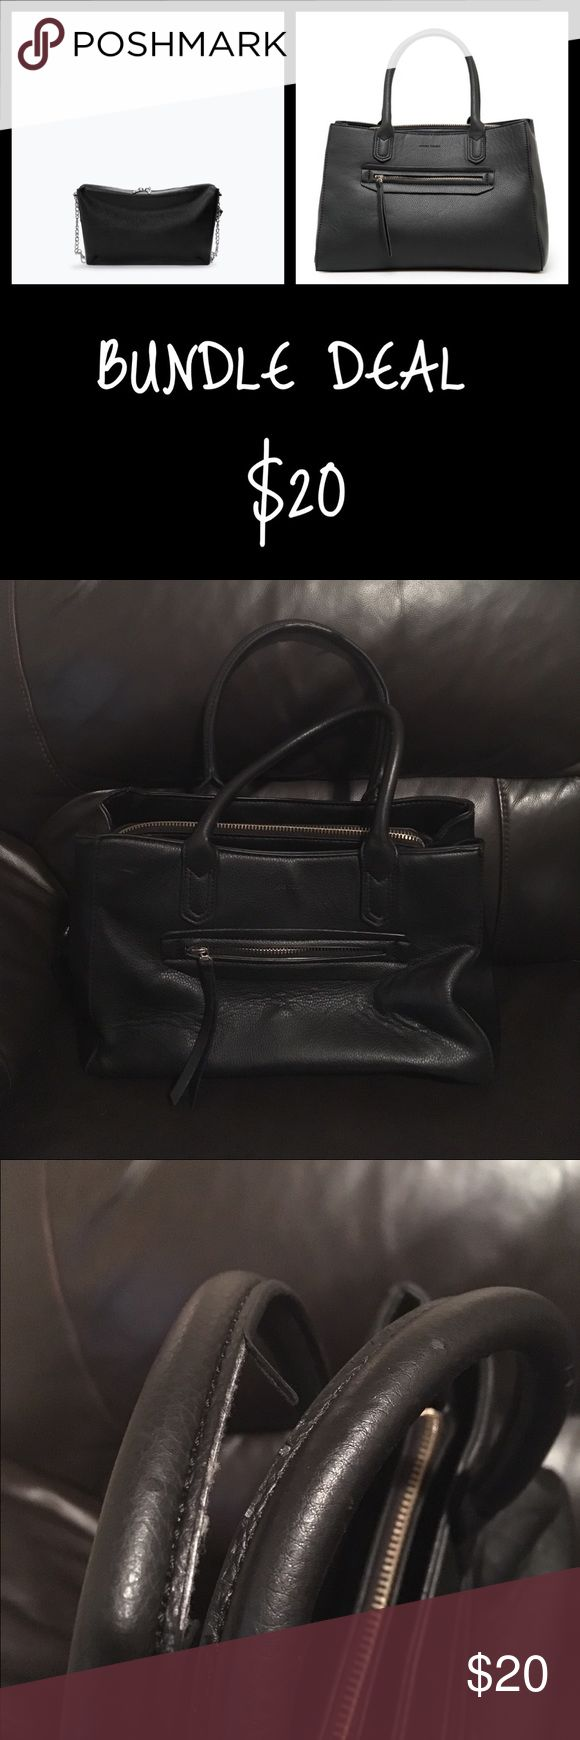 ⭐️BUNDLE DEAL⭐️ ZARA BAG & MANGO BAG Zara bag & MANGO bag Zara Bags